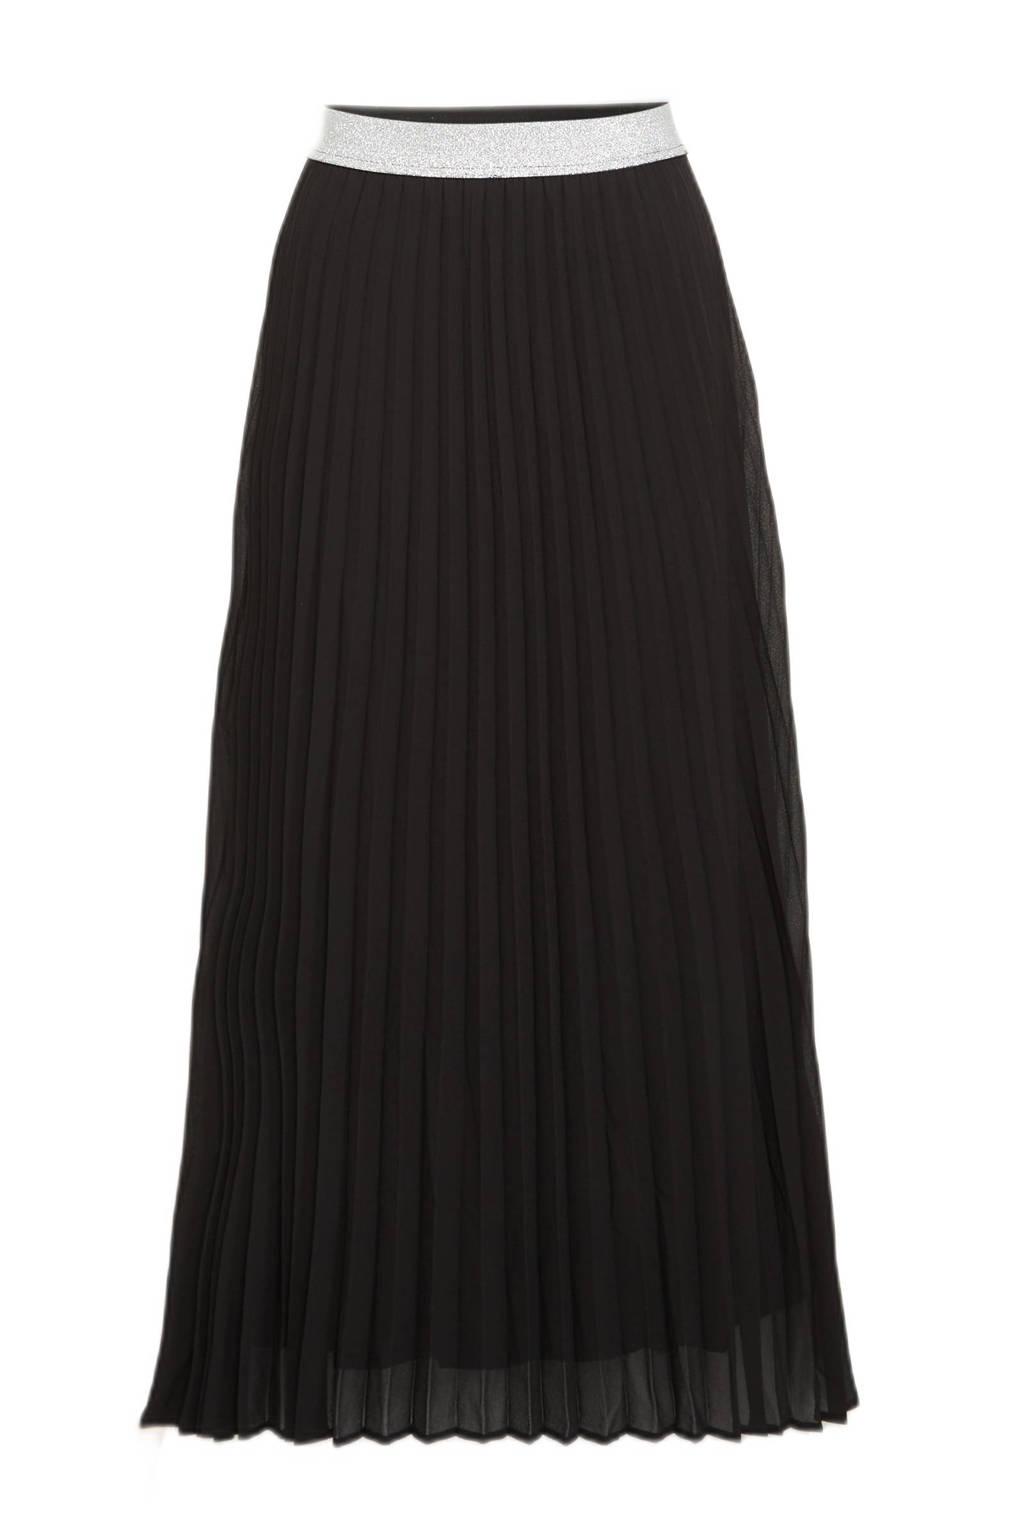 ONLY semi-transparante rok ONLMICA met plooien zwart, Zwart